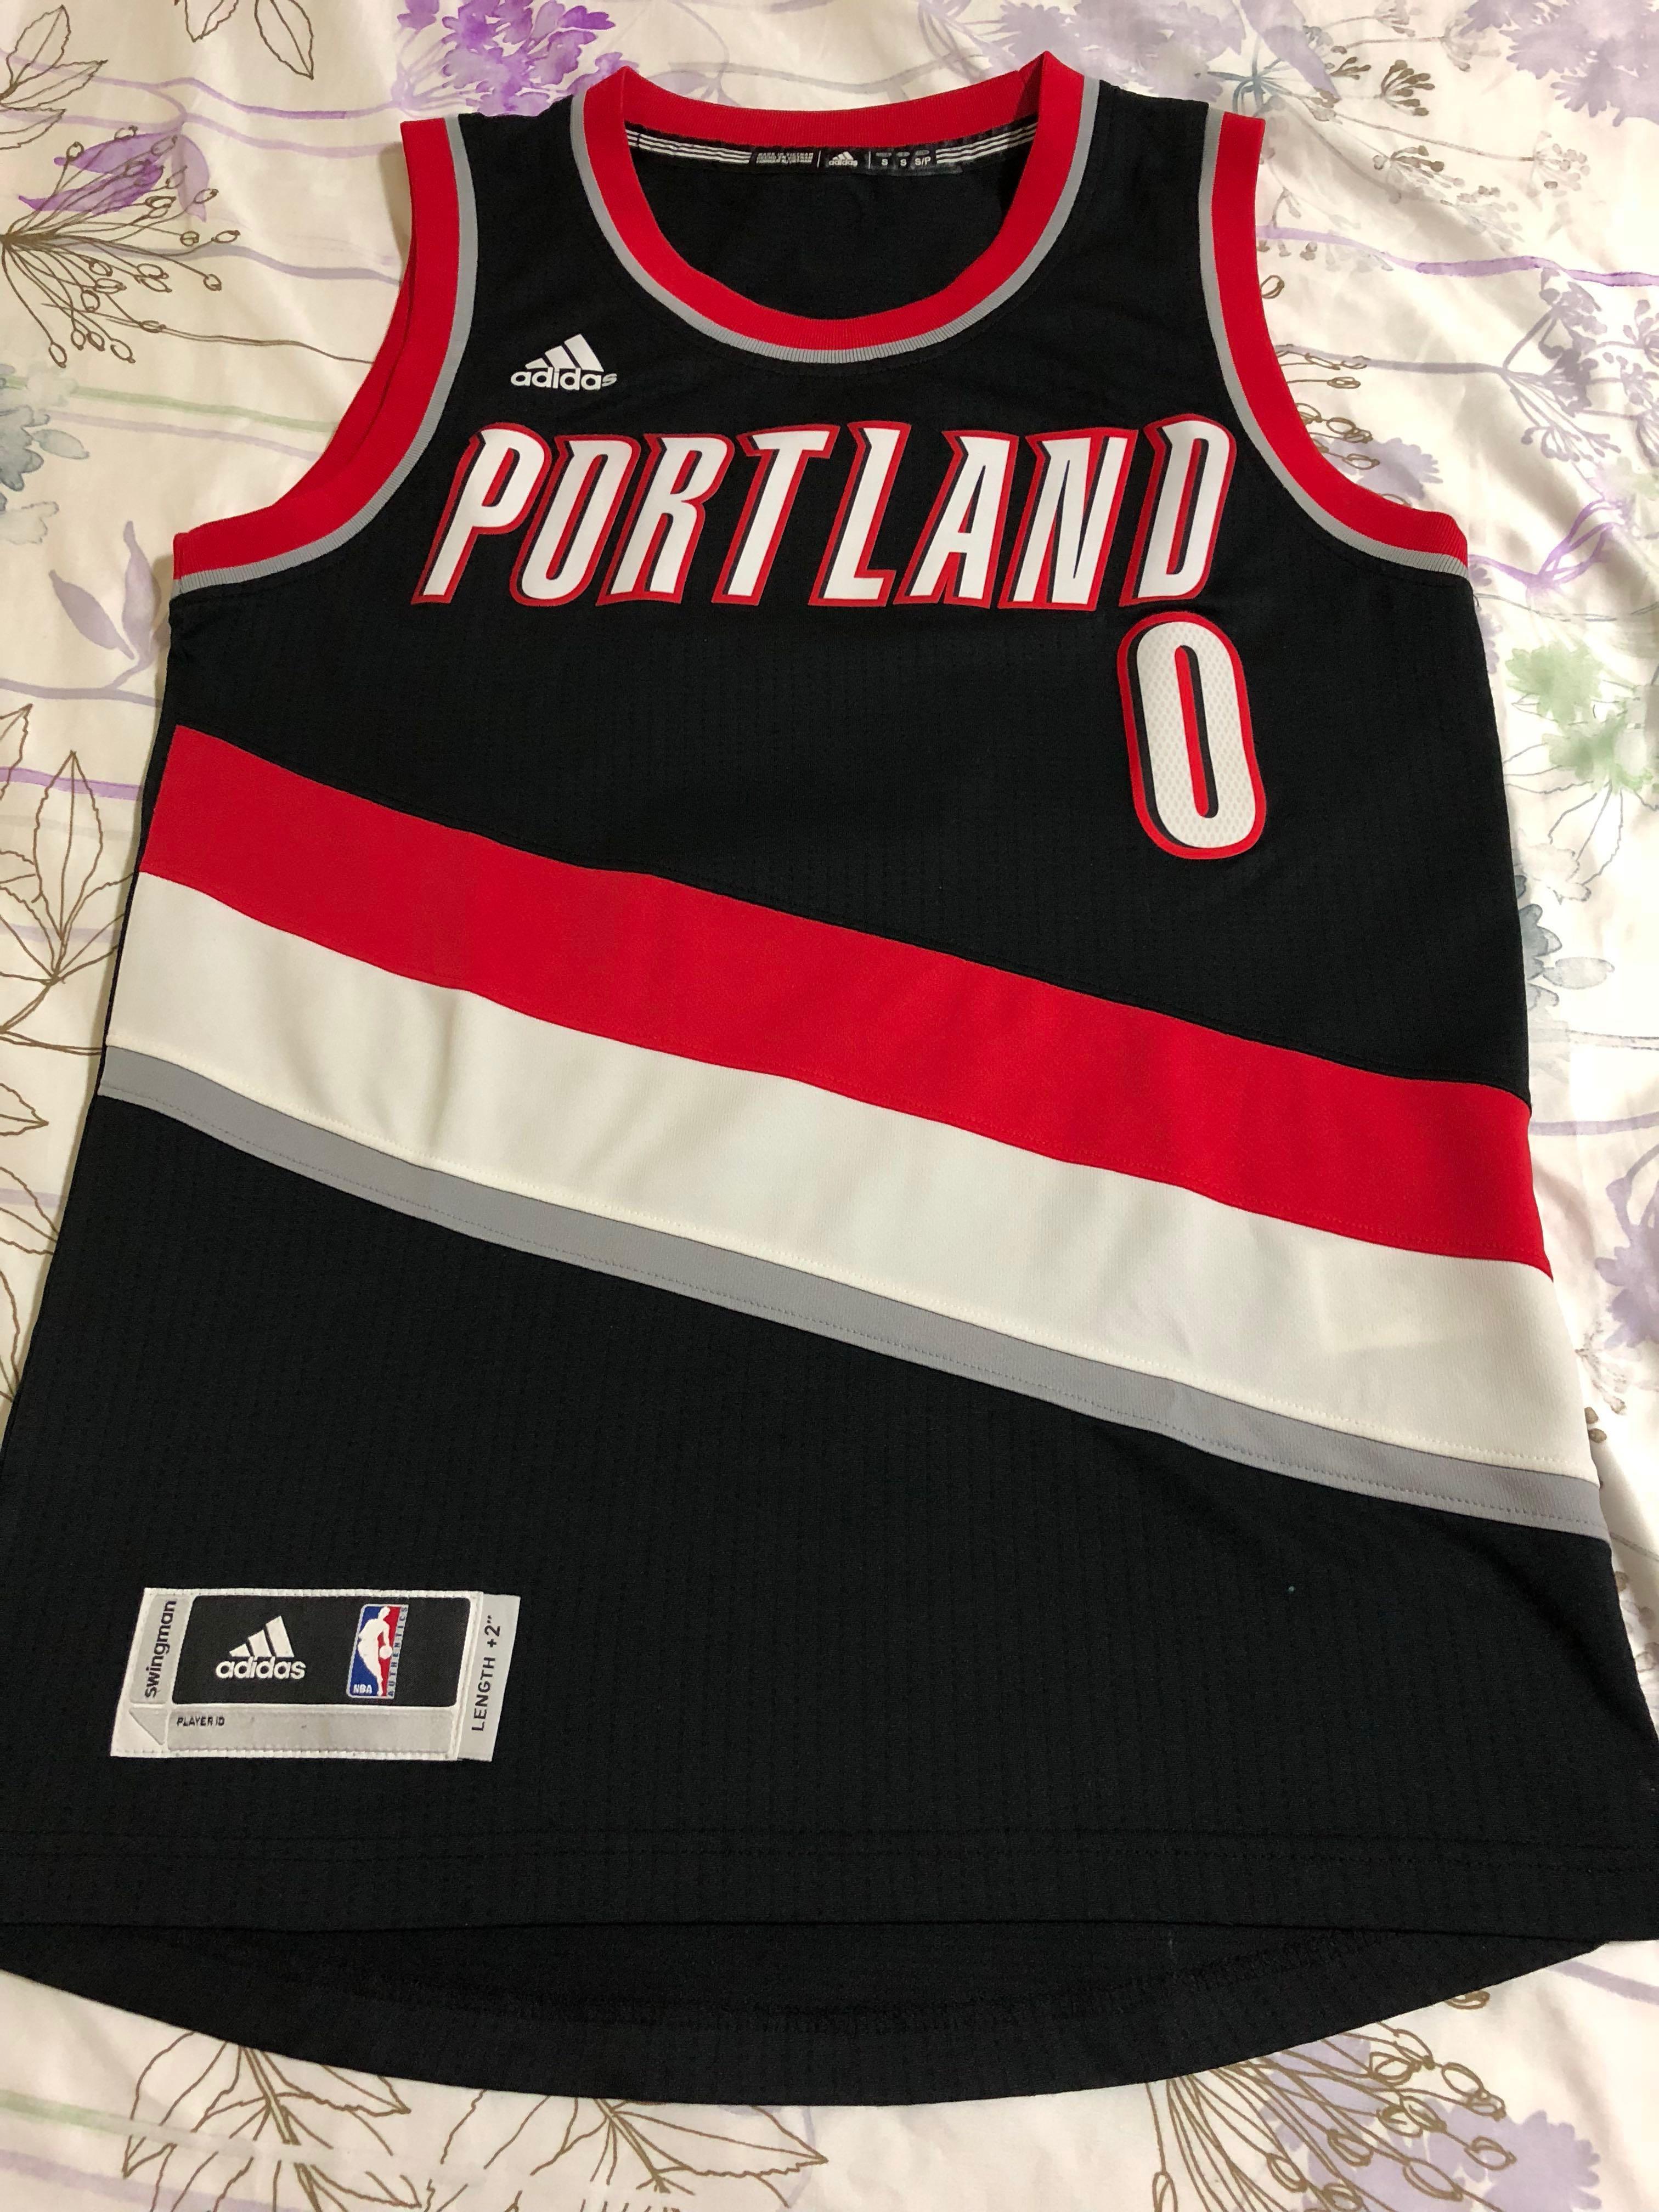 bf0e64741 Dame Lillard NBA Jersey, Sports, Sports Apparel on Carousell